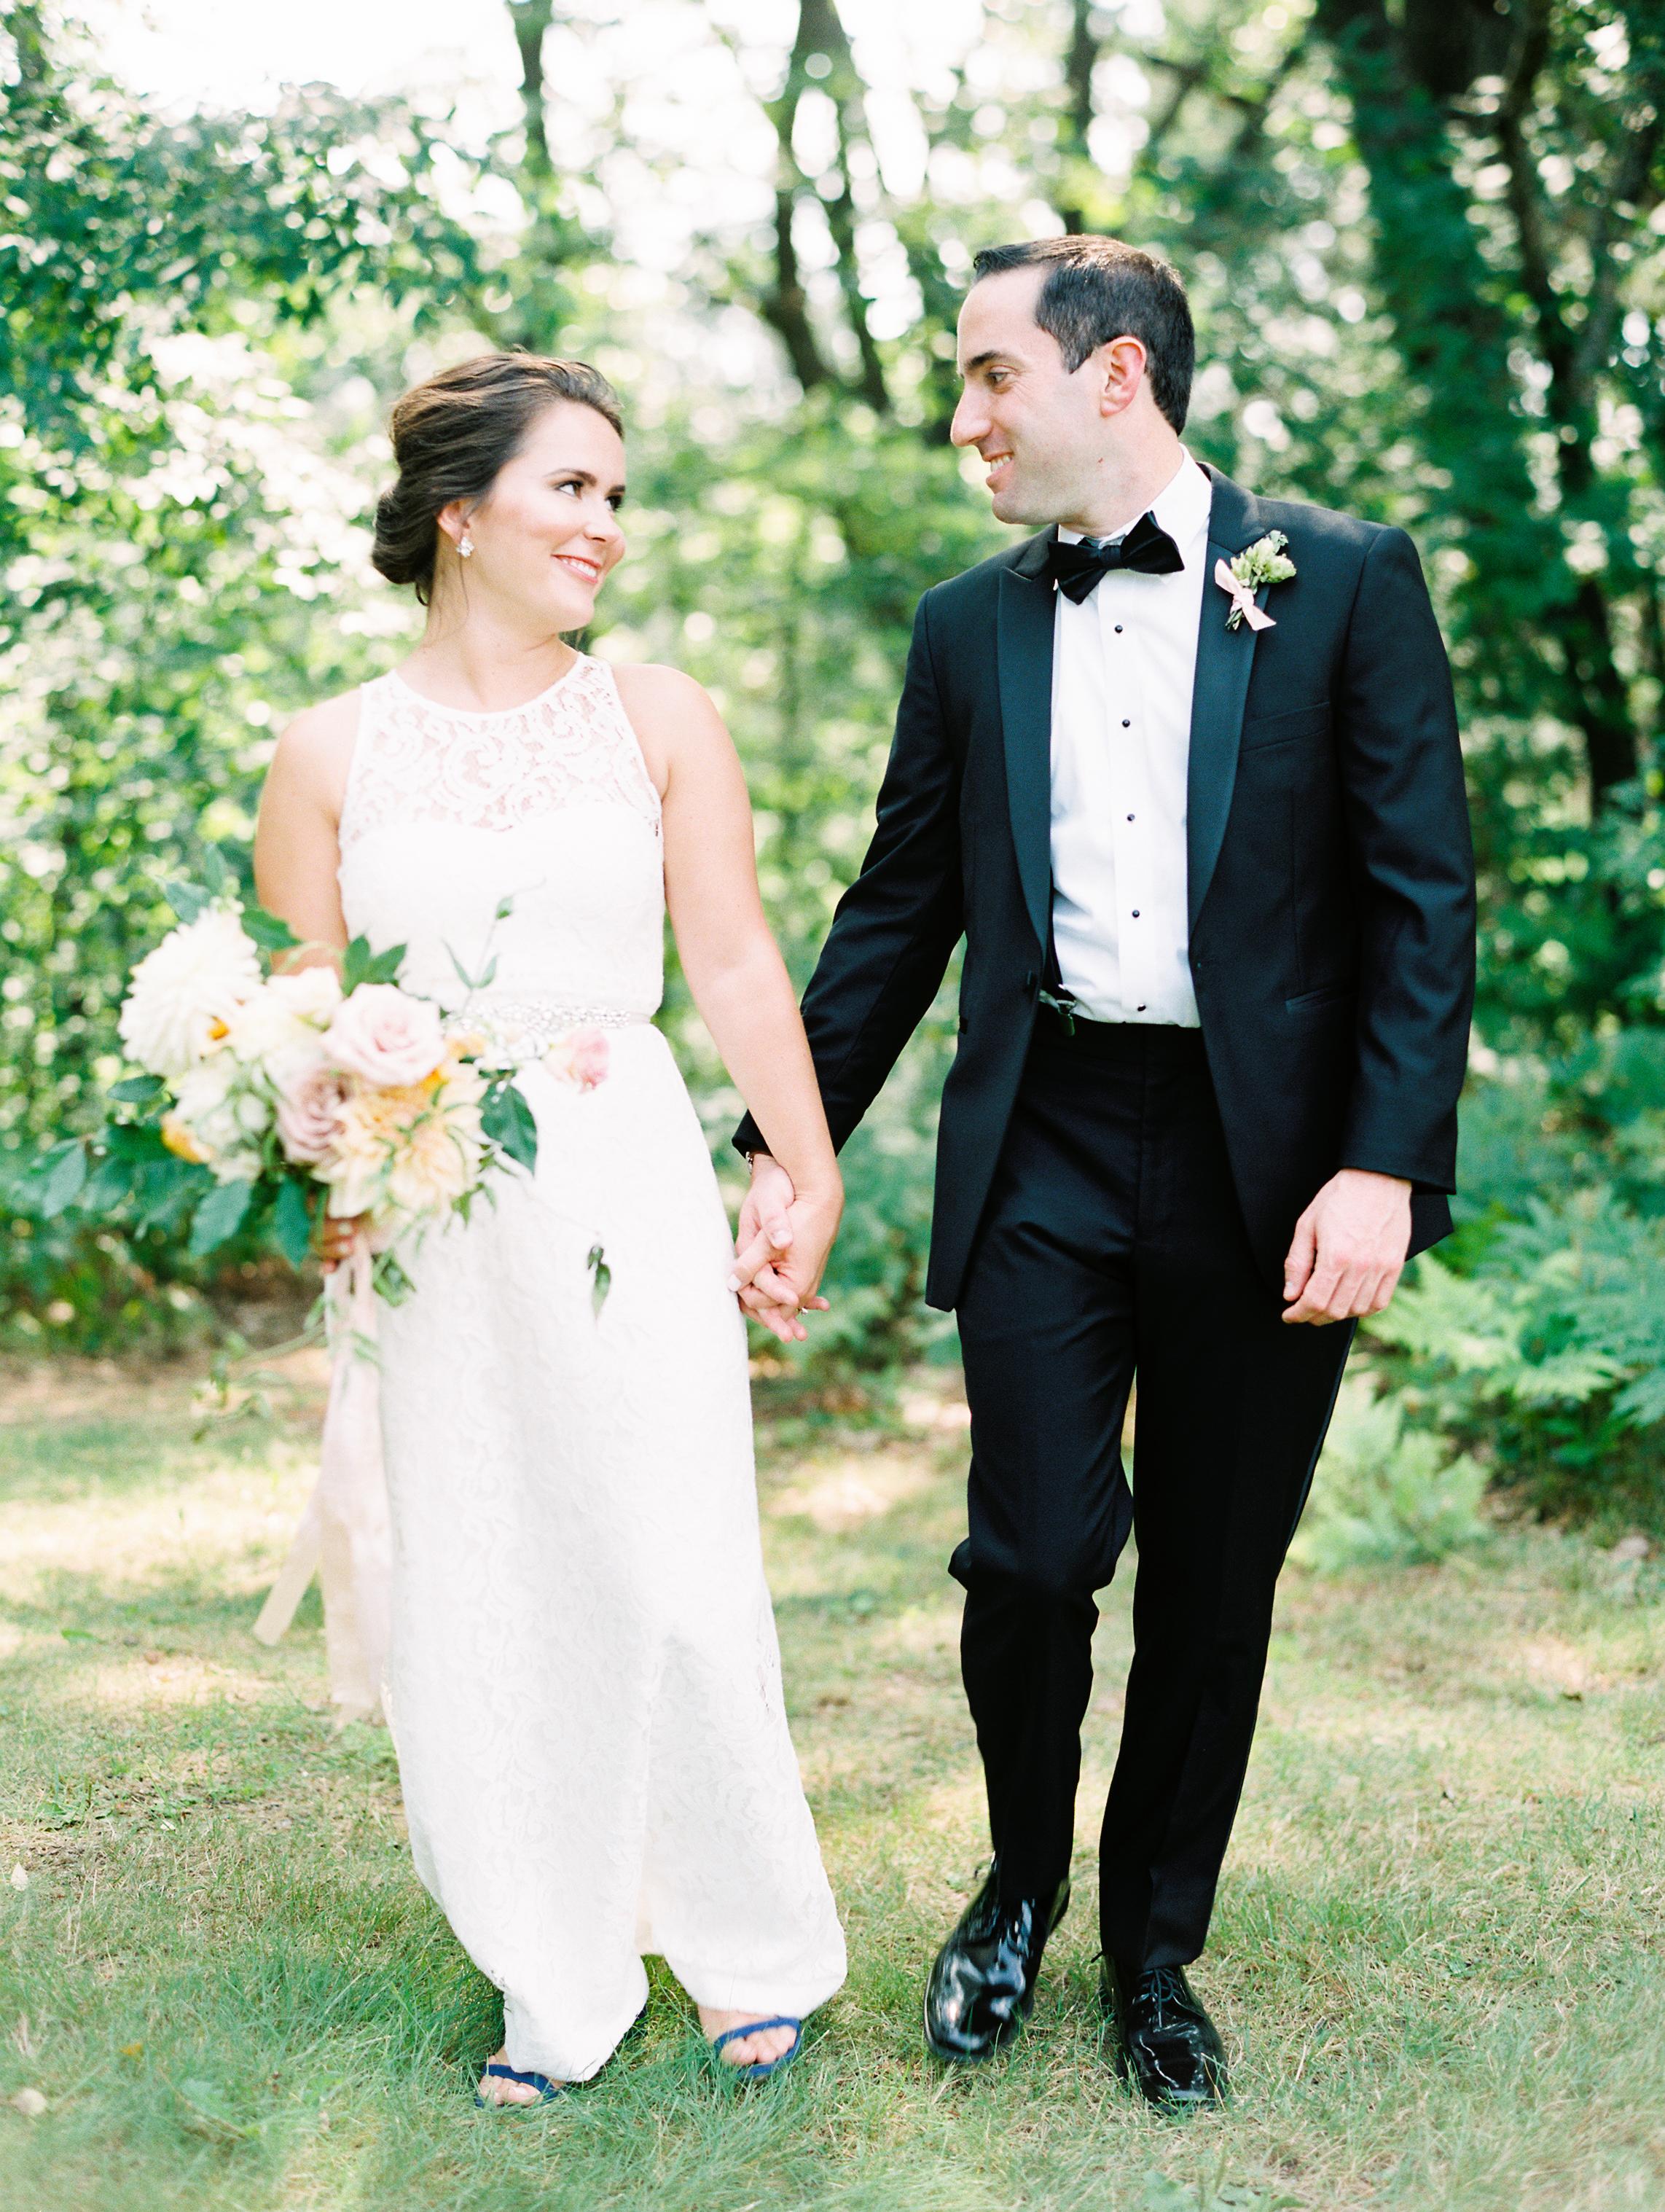 Zoller+Wedding+Bridal+Partyf-54.jpg